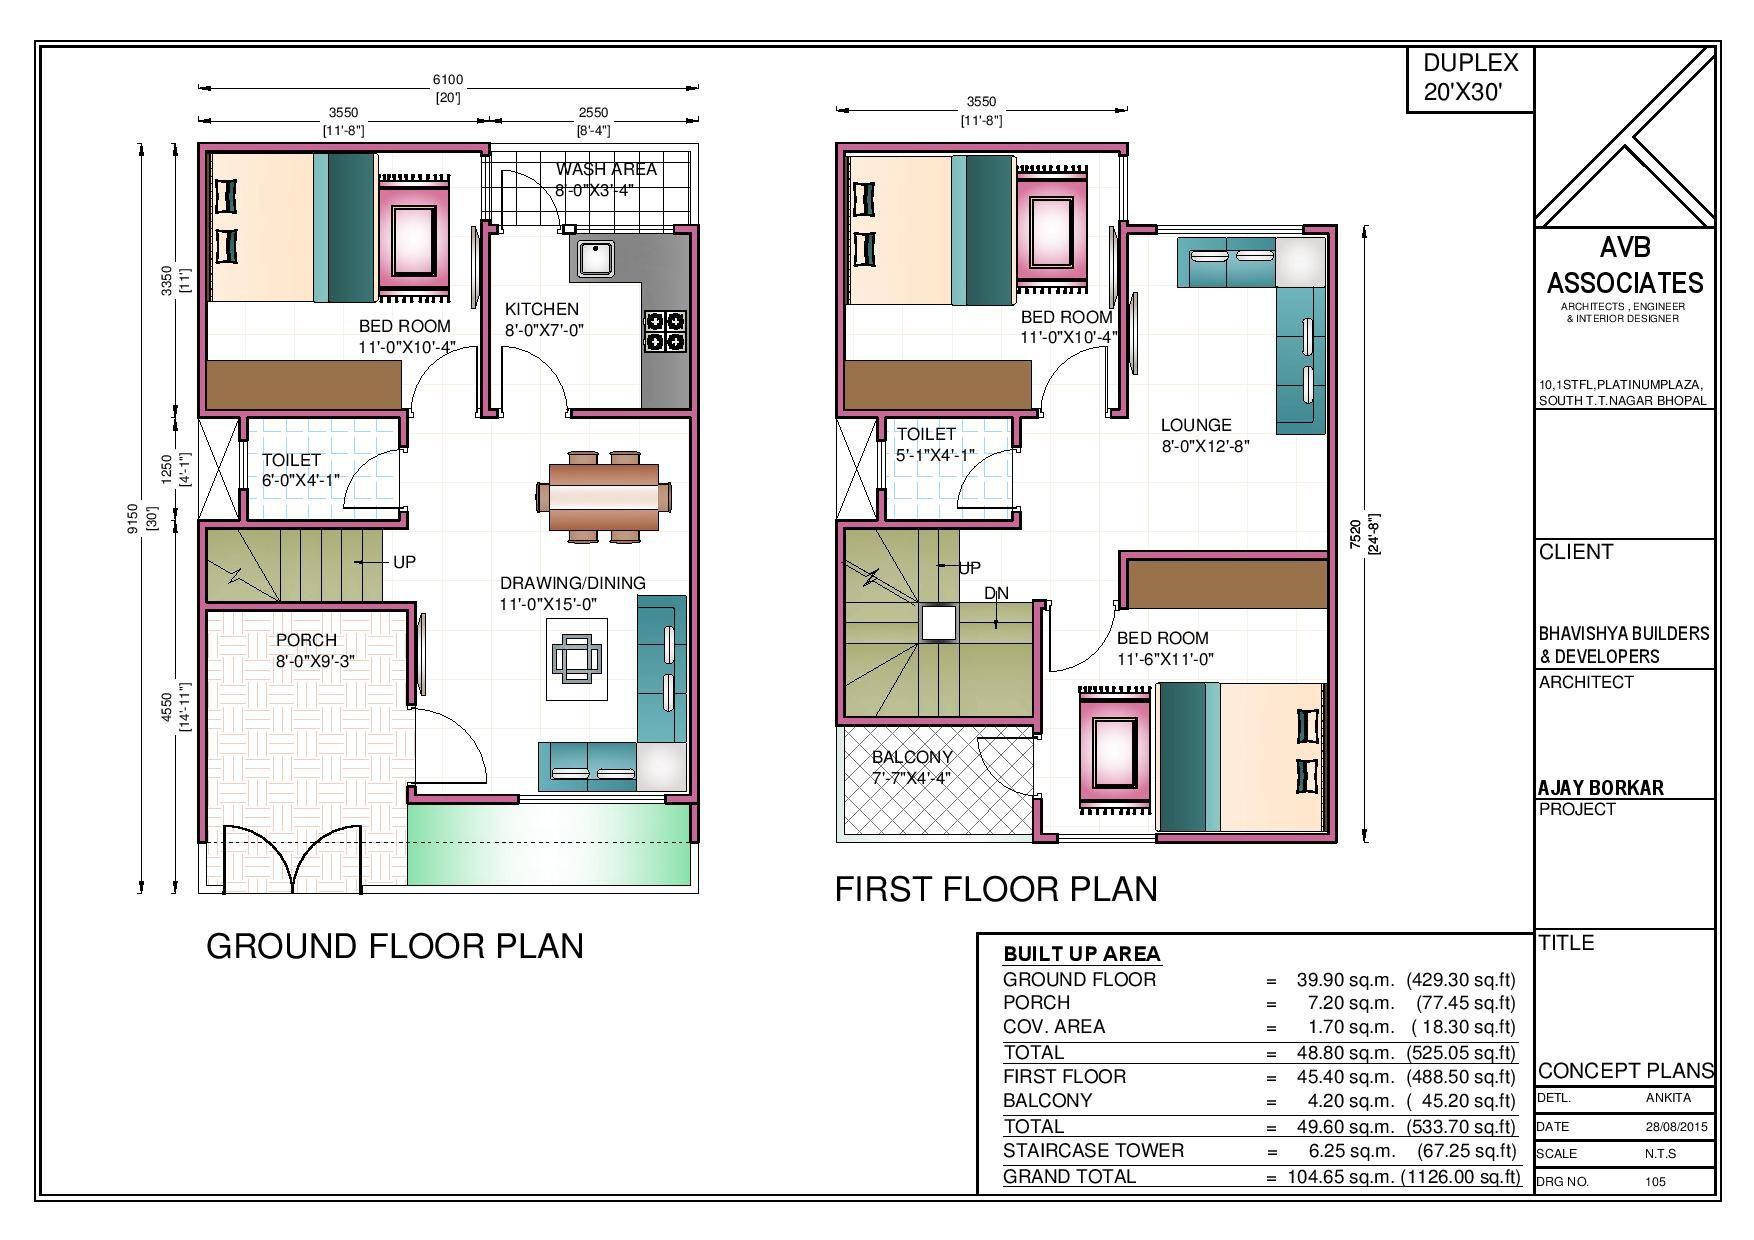 houseplandesignplanninghouses_281465.jpg (1754×1240